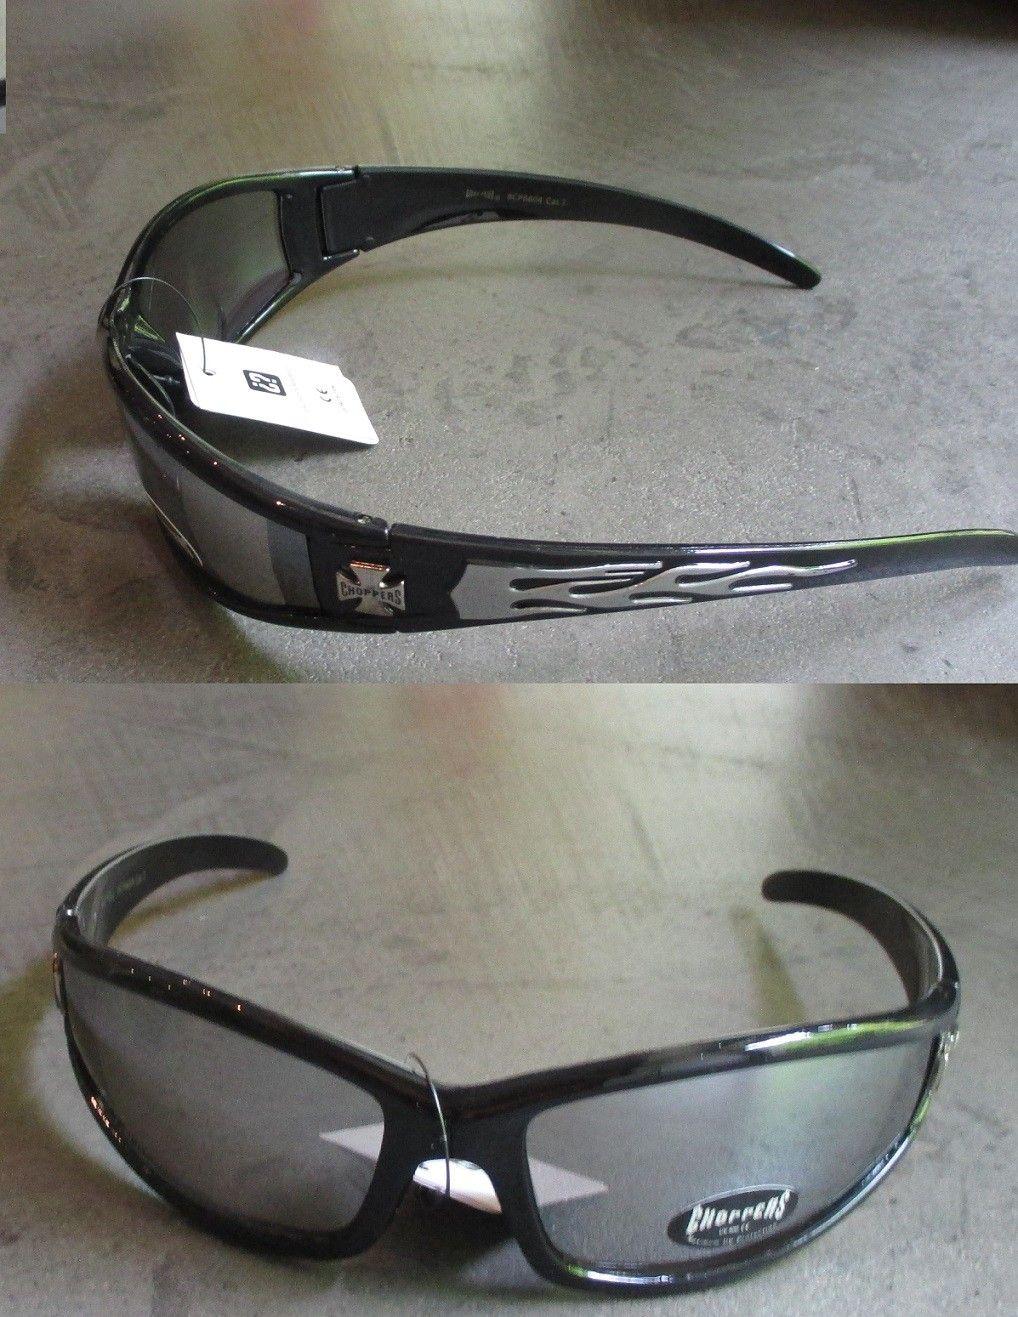 hotrodspirit - lunette de soleil choppers croix malte flamming rouge or qKj1U2WJw